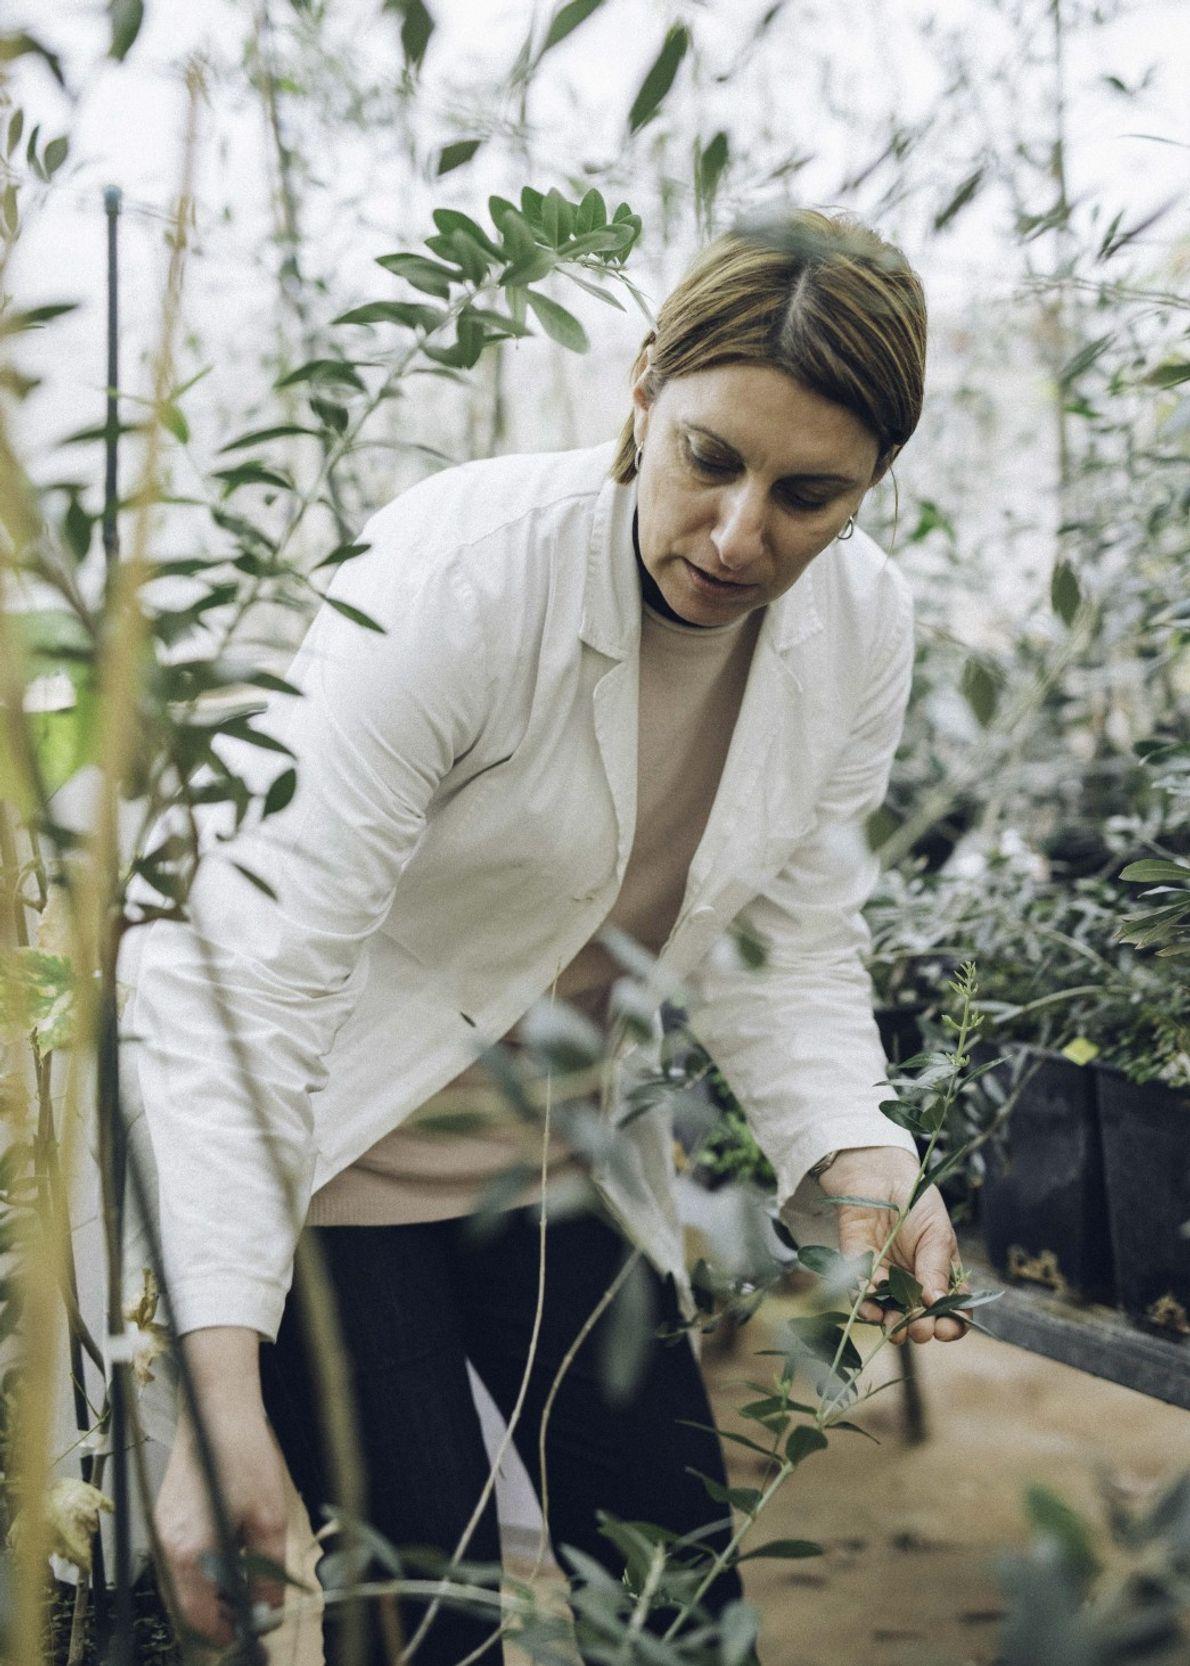 Maria Saponari, investigadora del CNR de Bari, estudia formas de combatir la Xylella.